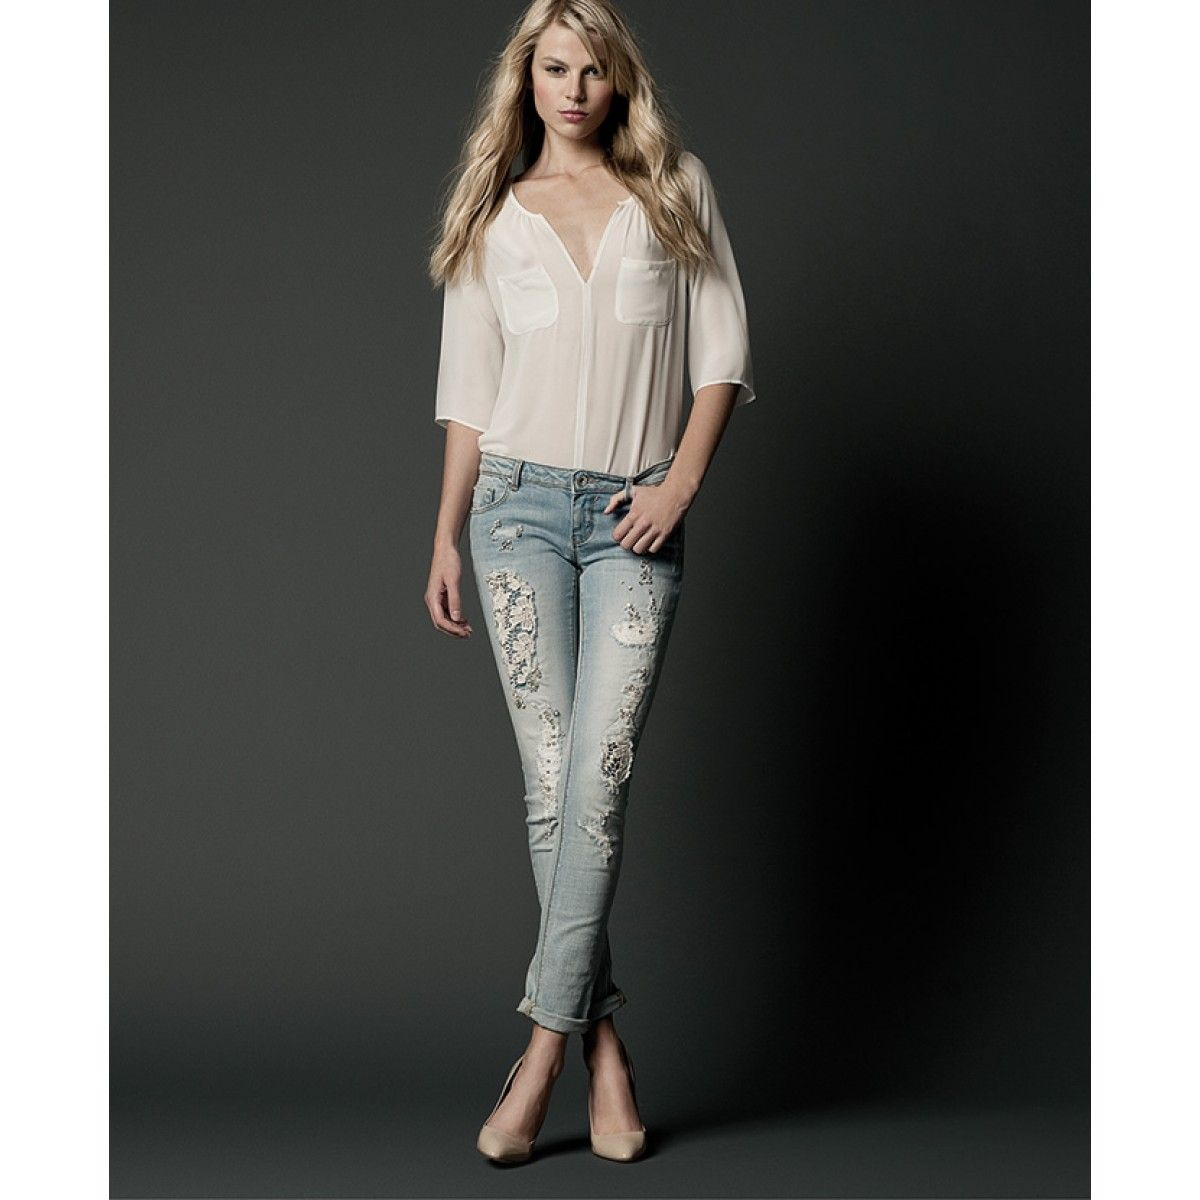 Fracomina denim fracomina Online skinny Five Greta1 Shop pocket pfYgp